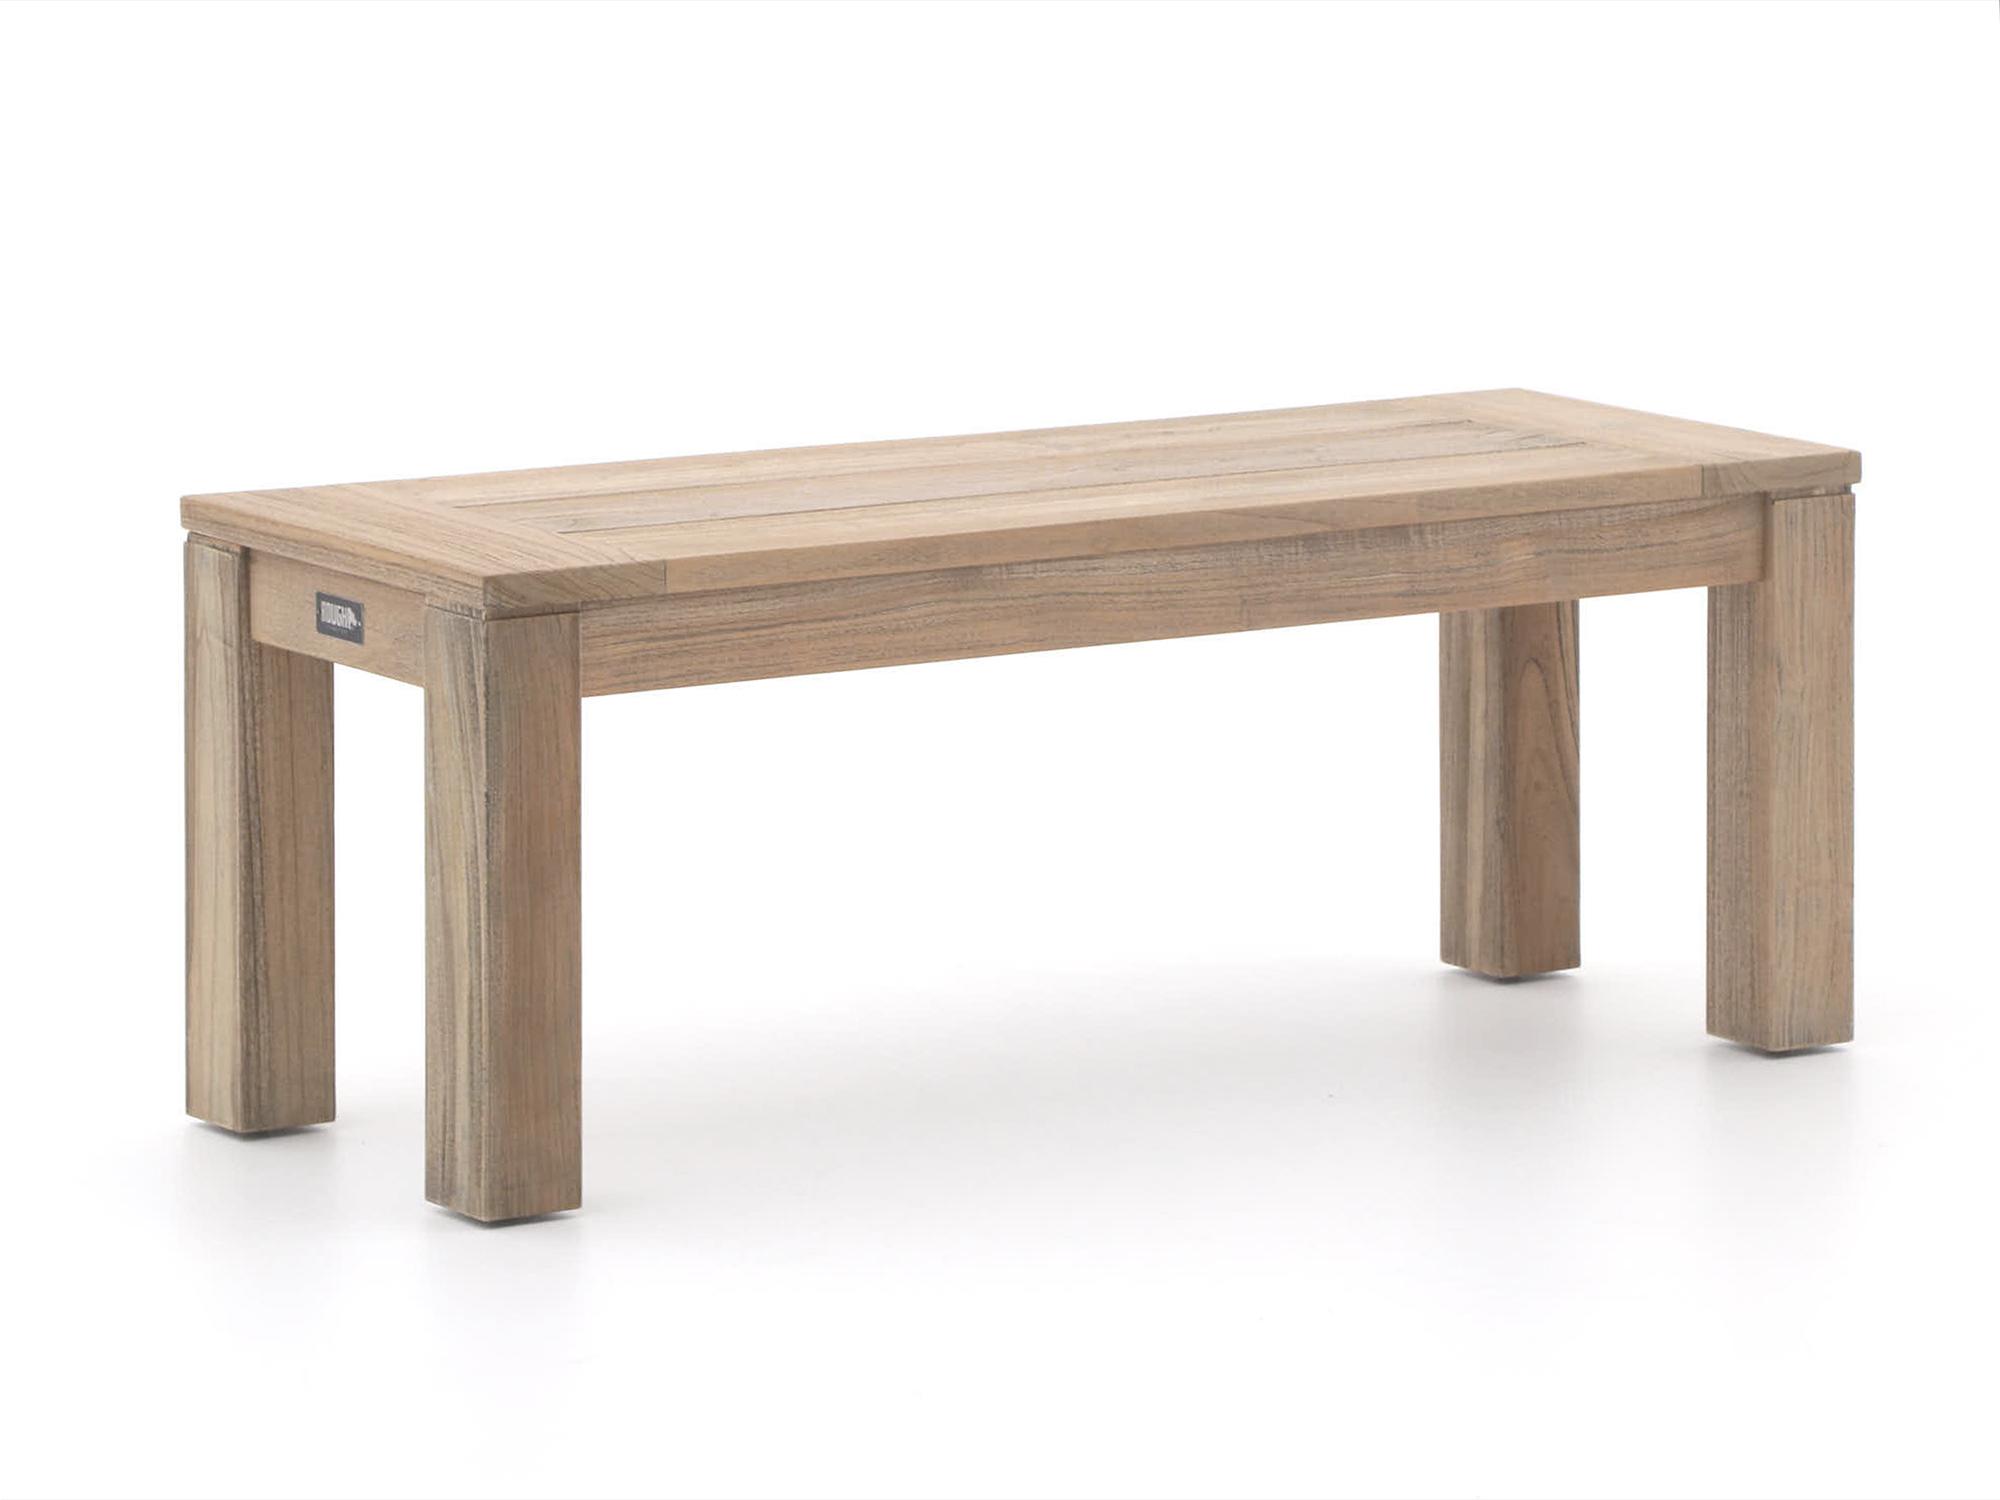 ROUGH-X picknickbank 120x42x45cm - Laagste prijsgarantie!